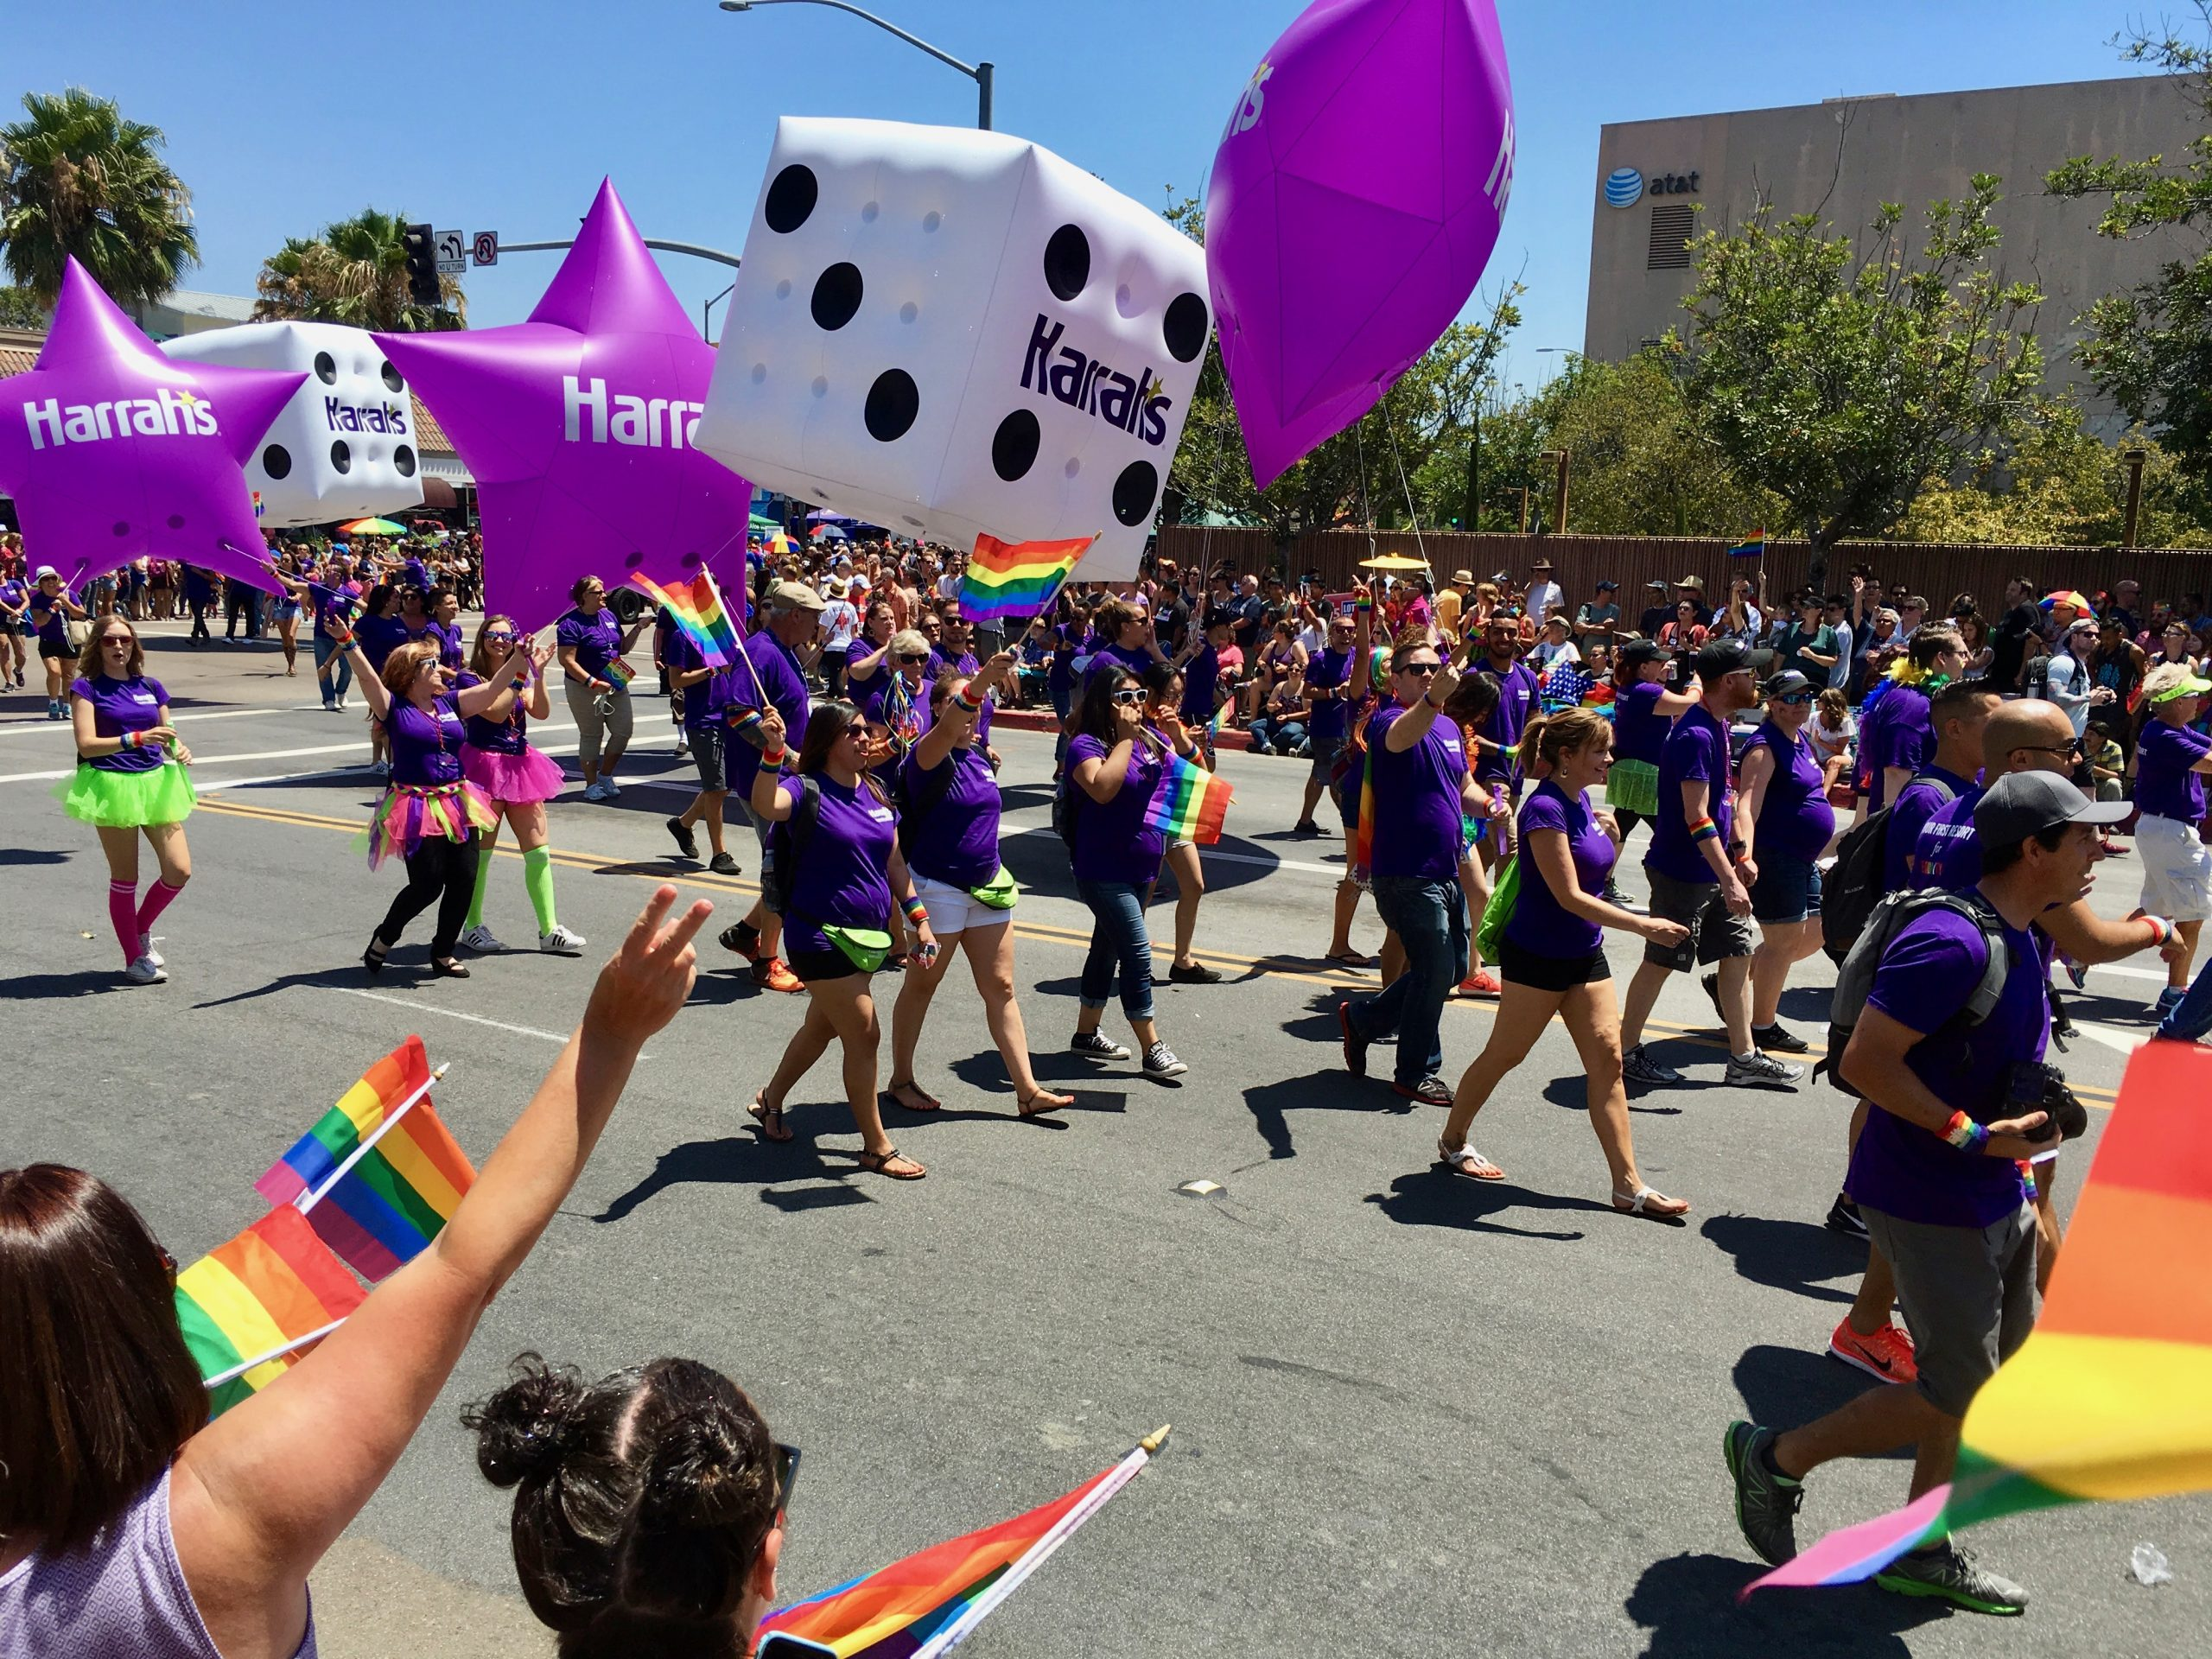 Harrah's shows support for LGBTQ community at San Diego Gay Pride Parade